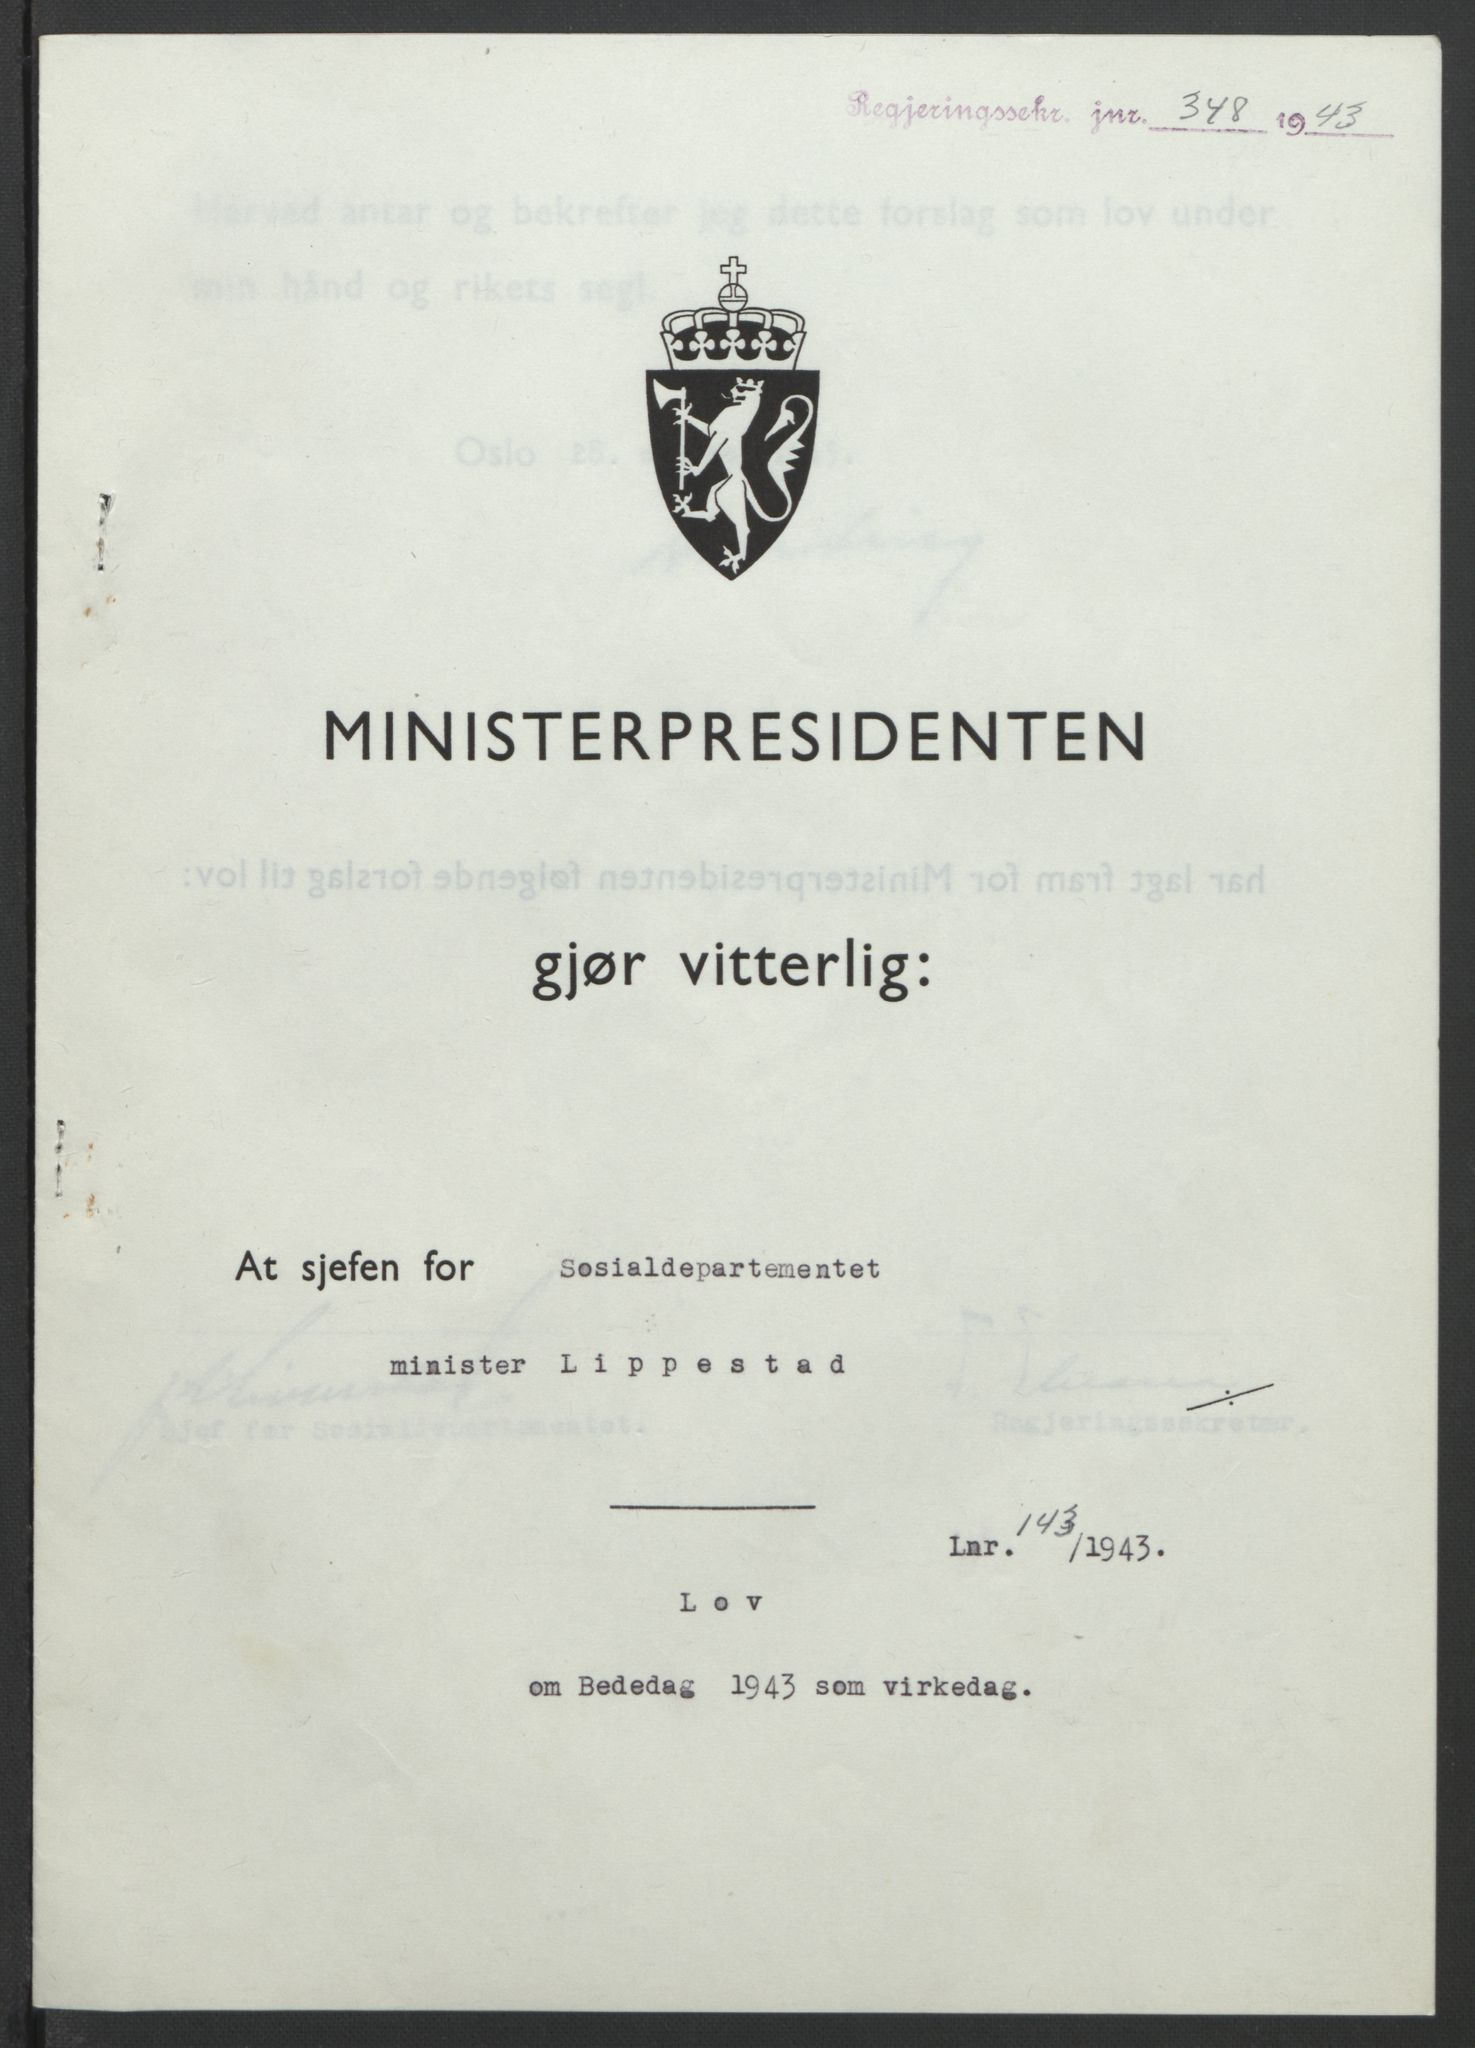 RA, NS-administrasjonen 1940-1945 (Statsrådsekretariatet, de kommisariske statsråder mm), D/Db/L0099: Lover, 1943, s. 665